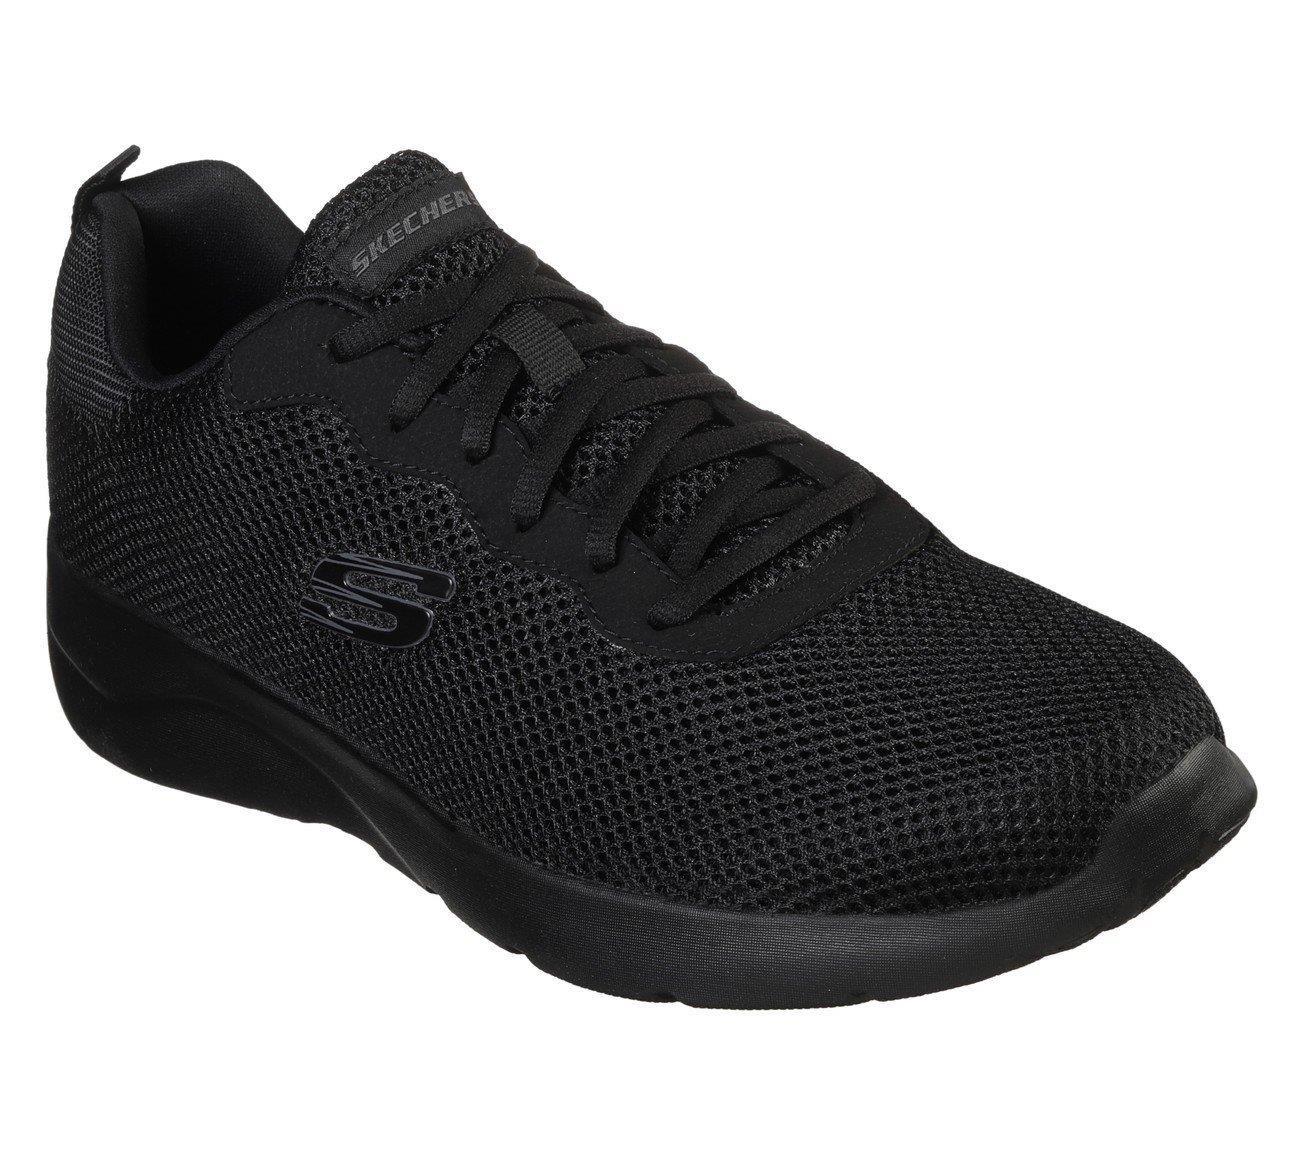 Skechers Dynamight 2.0 - Rayhill Erkek Ayakkabı SKC58362 BBK